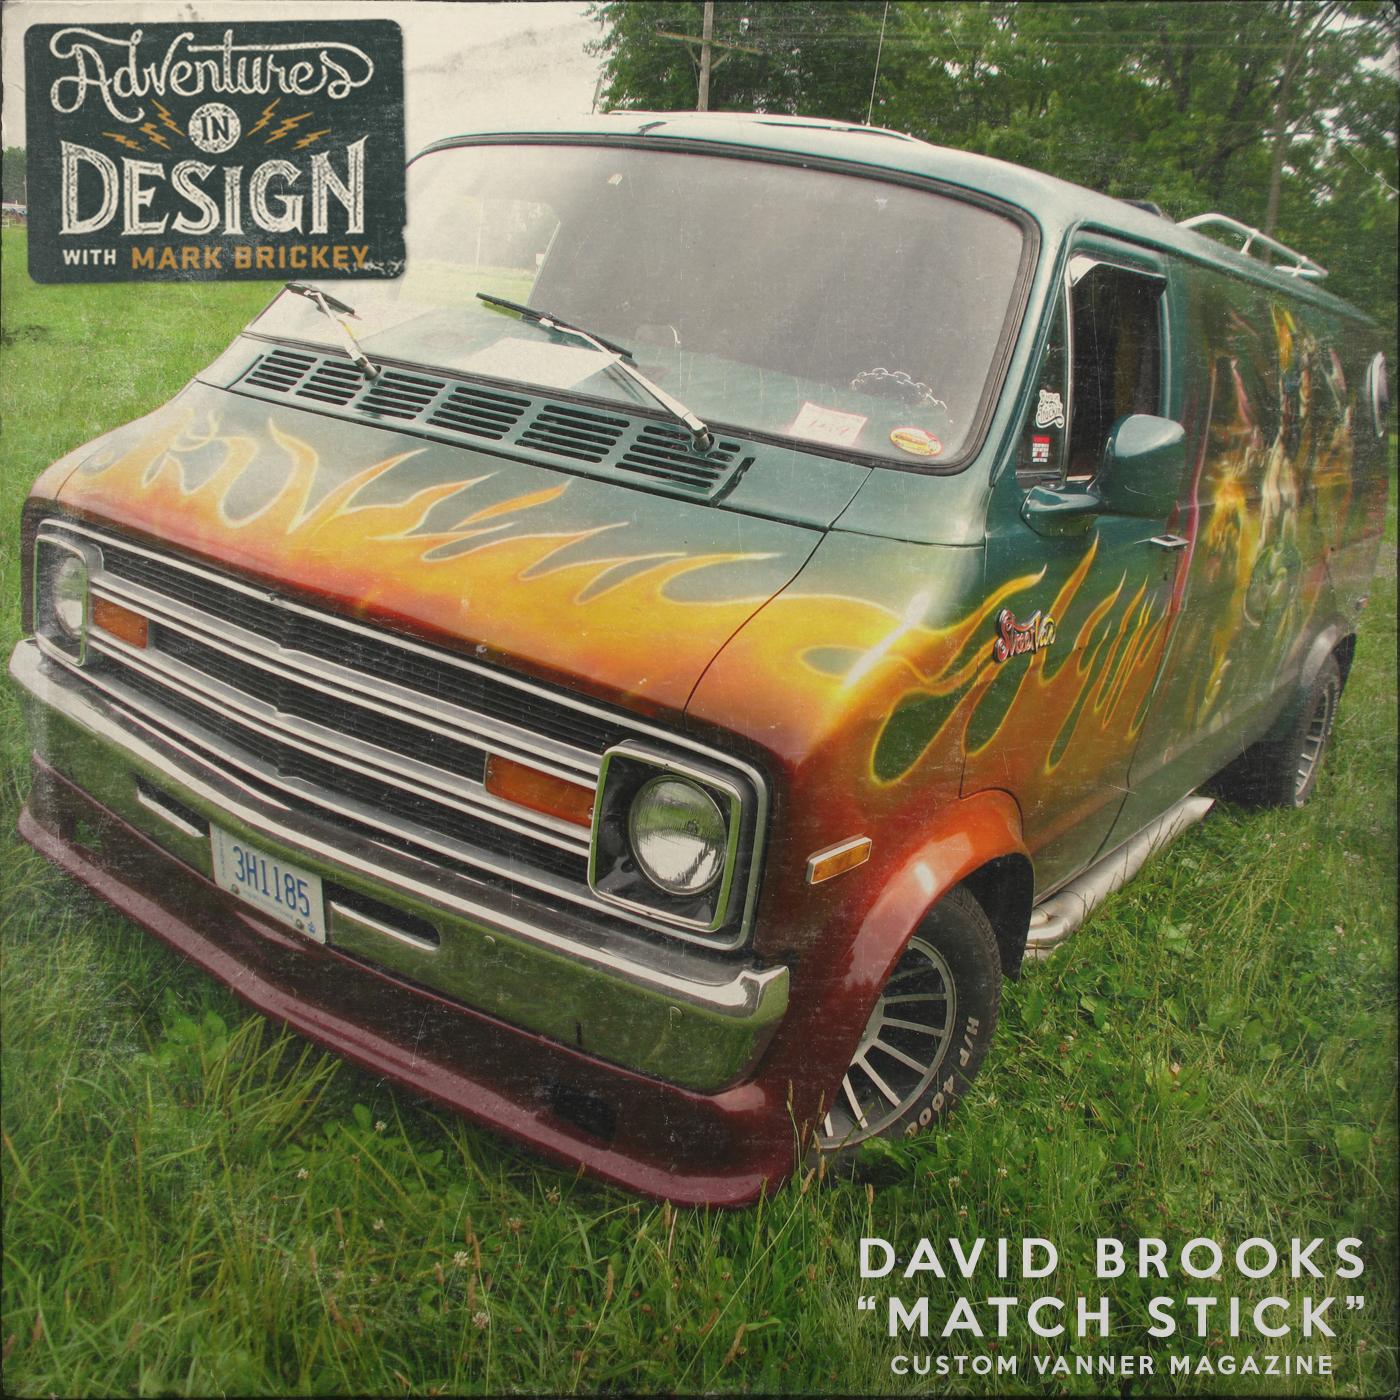 474 - David Brooks of Custom Vanner Magazine